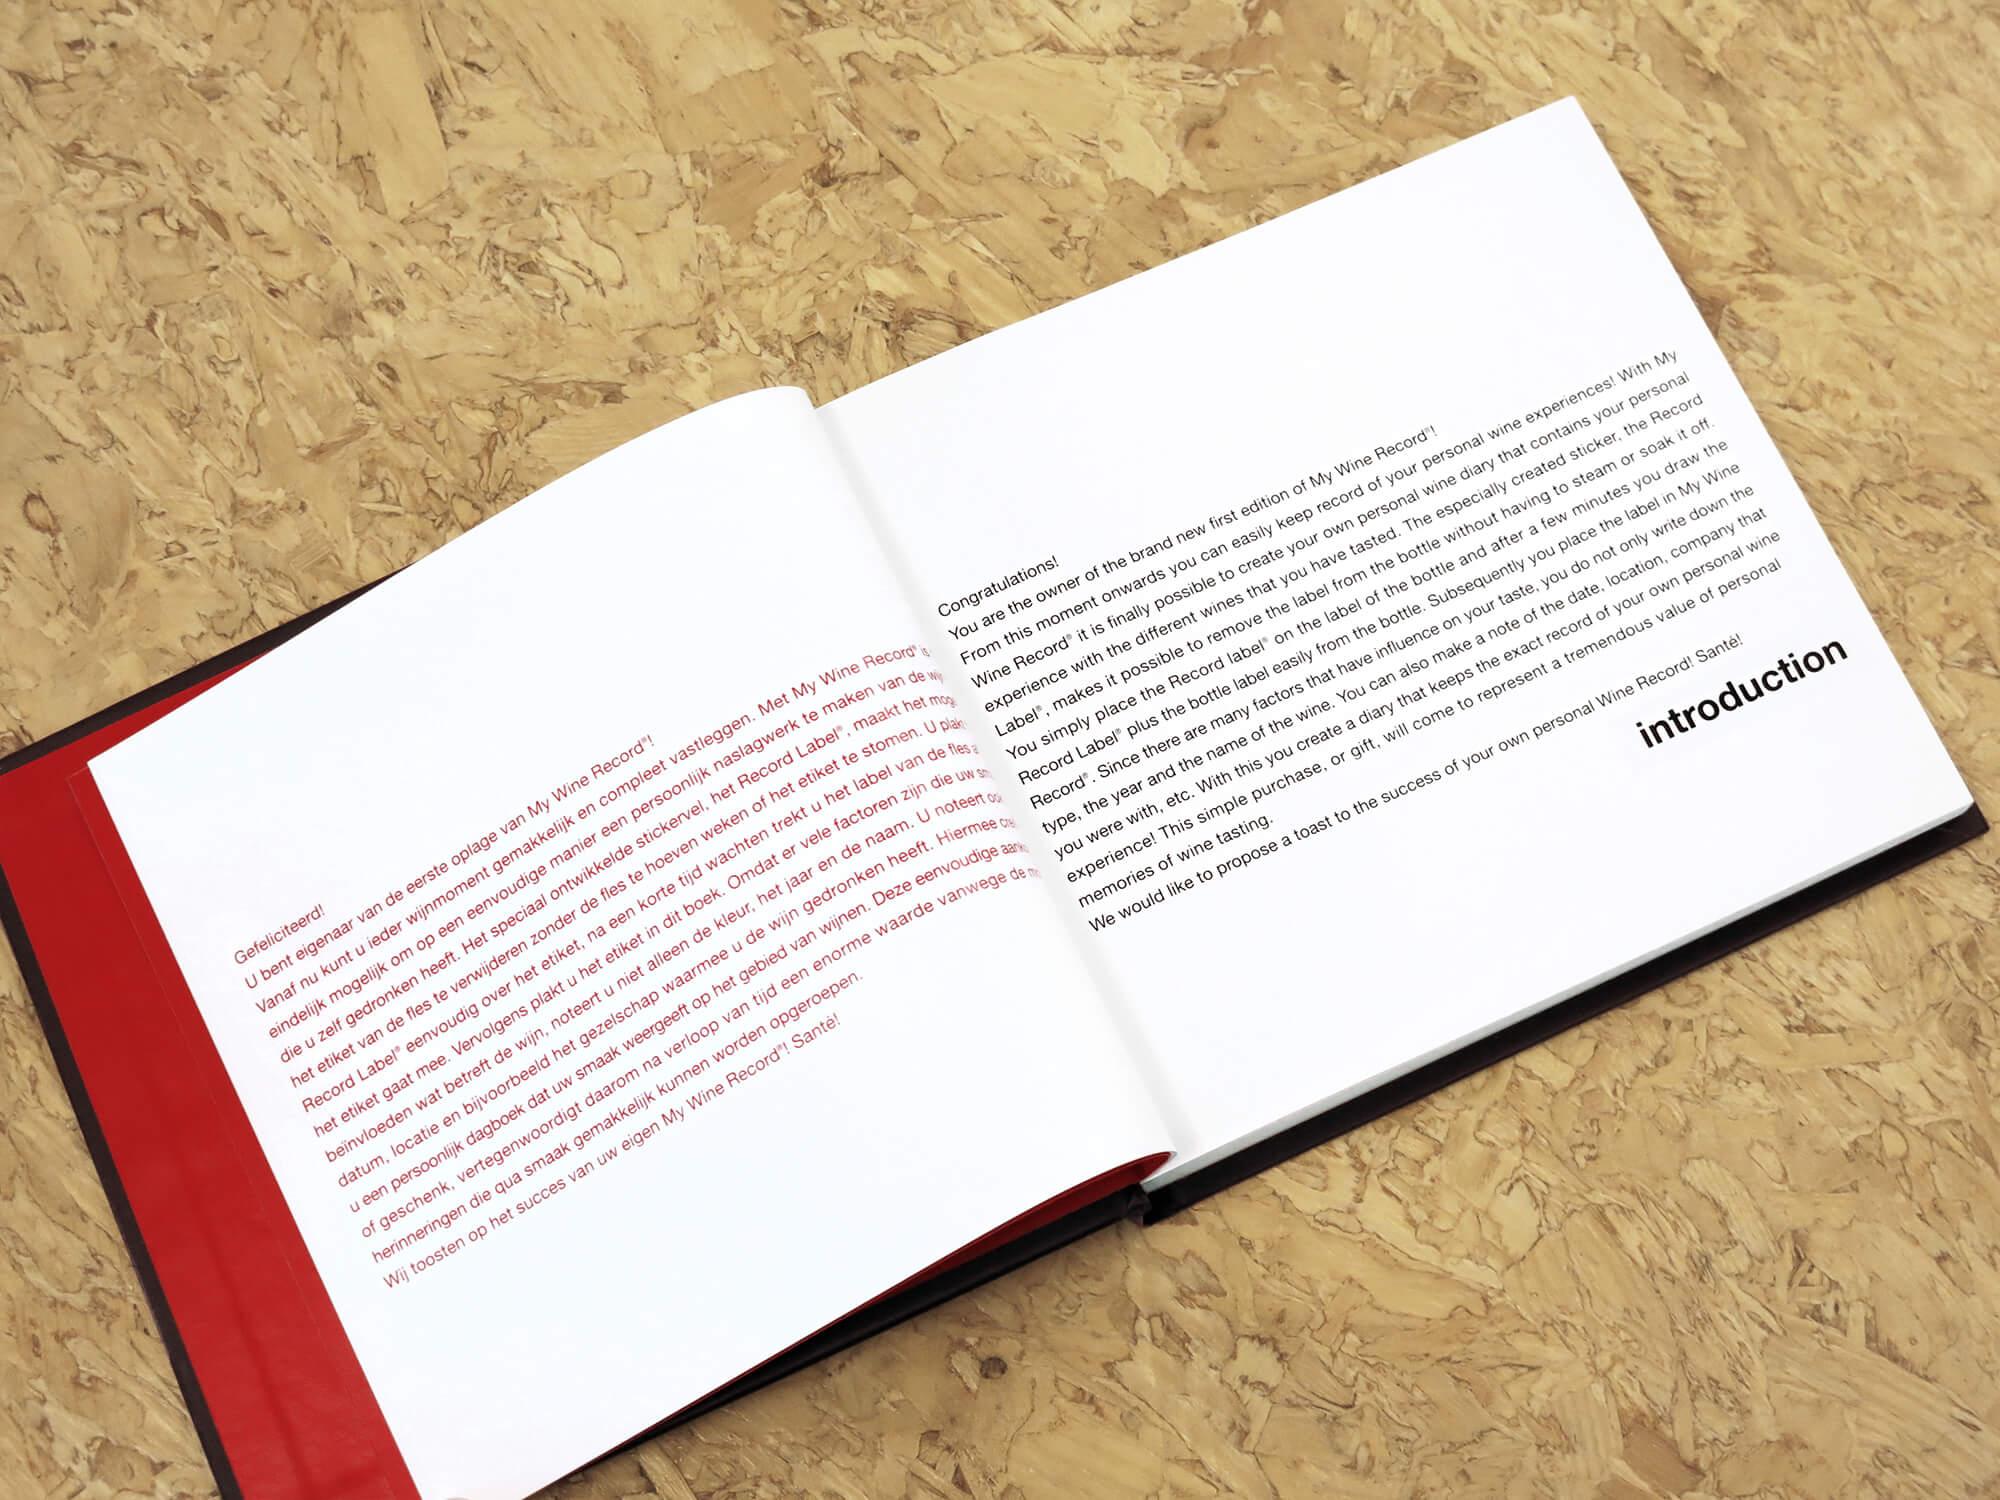 kapowski_mywinerecord_book_3